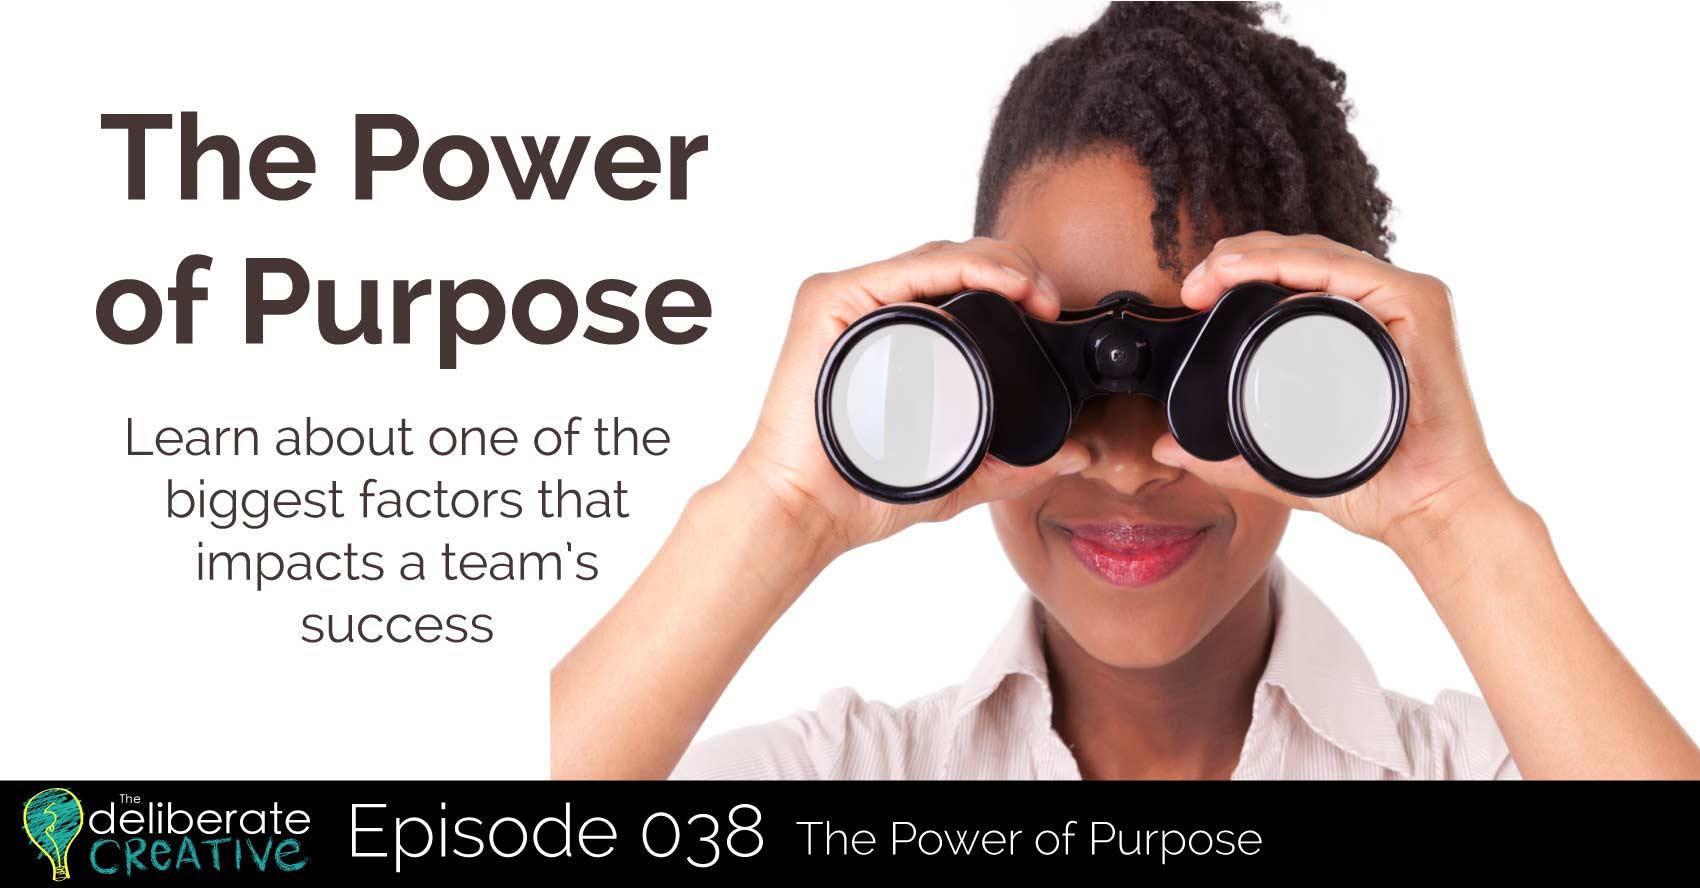 The Deliberate Creative Podcast Episode 38: The Power of Purpose